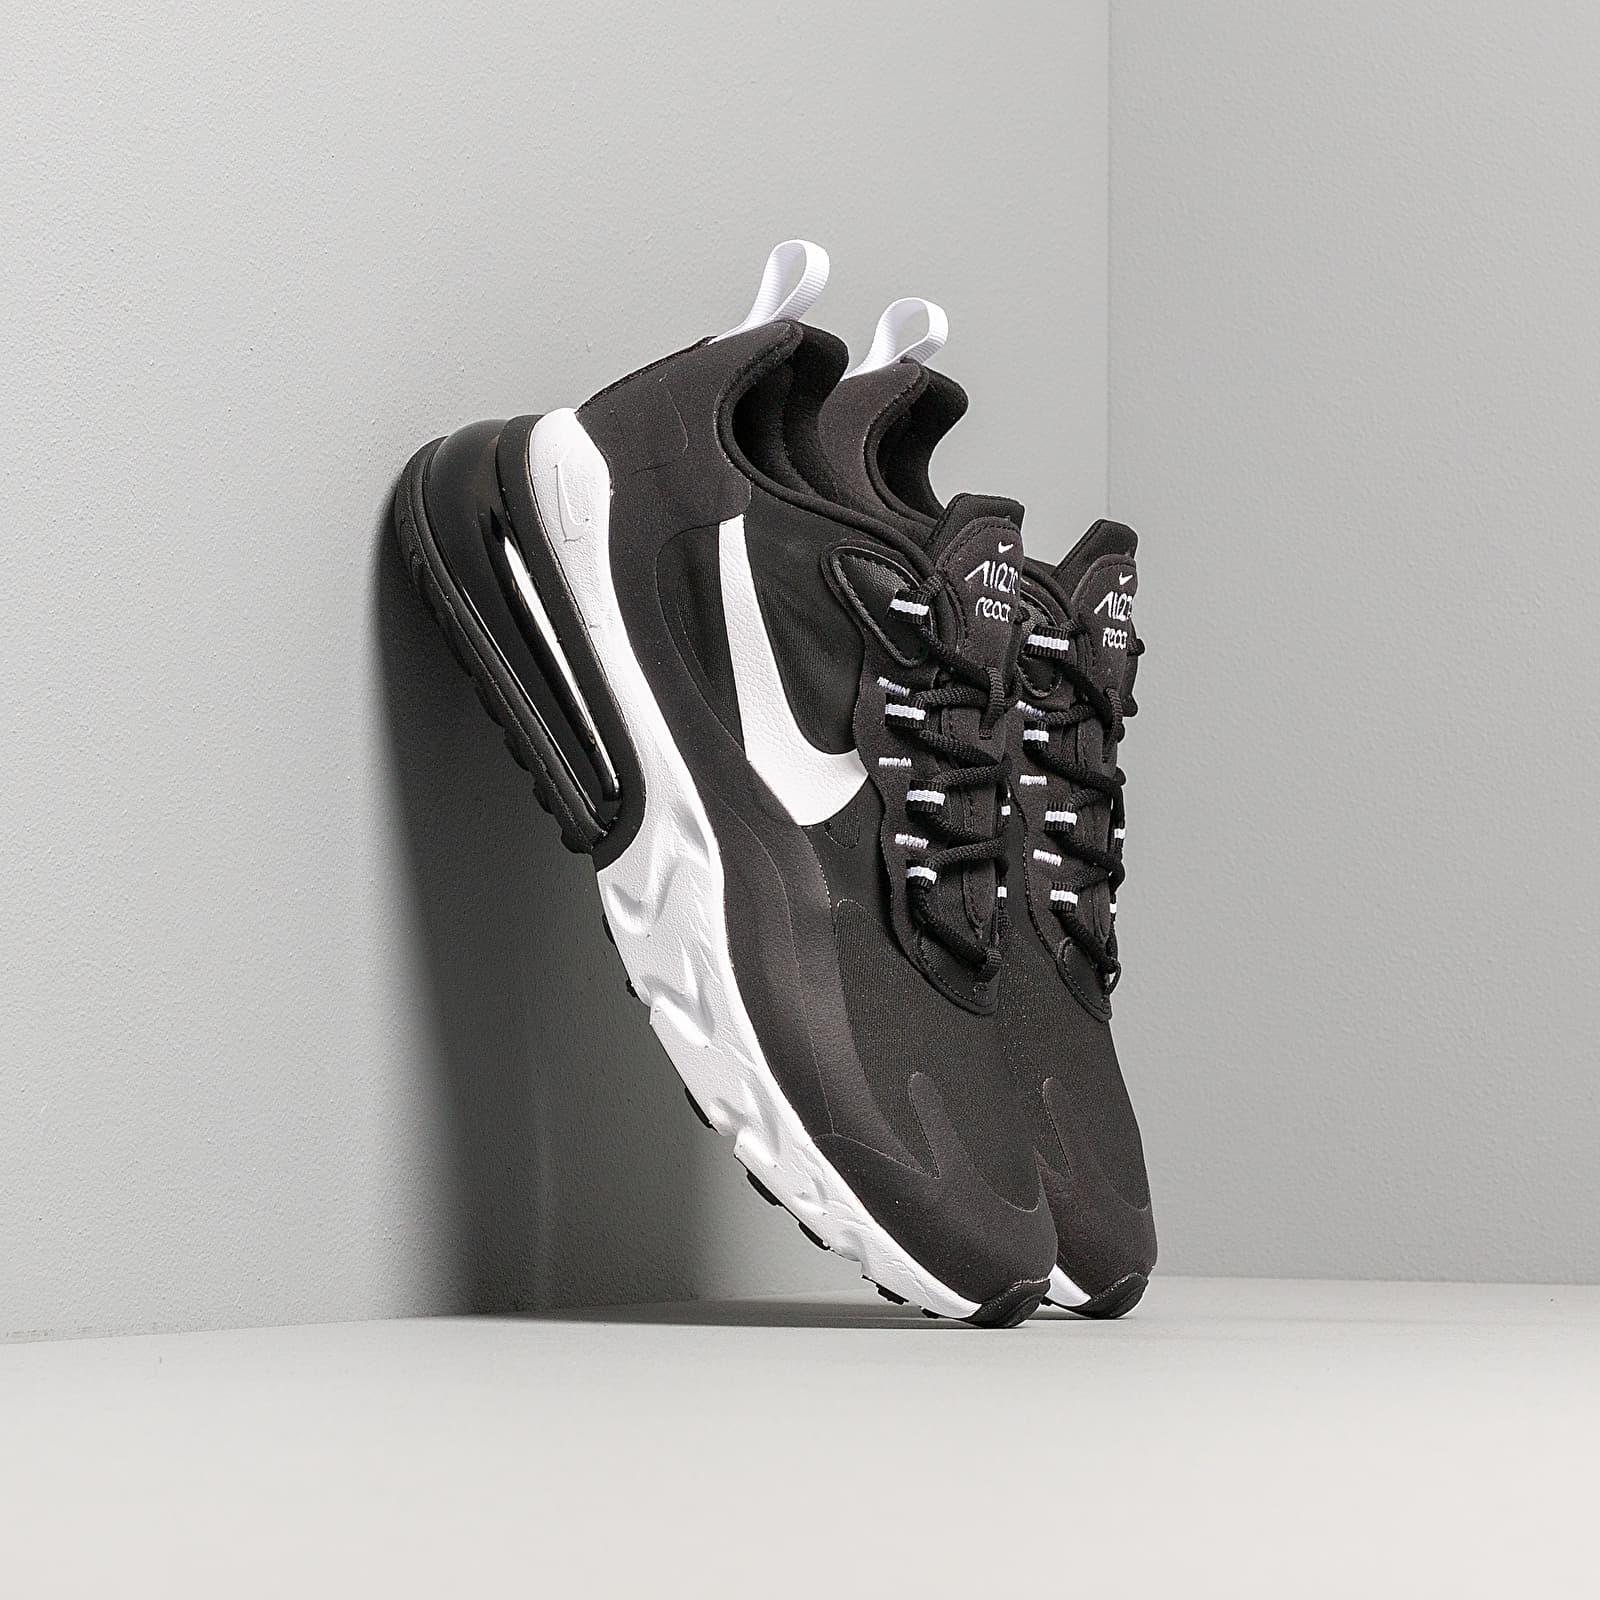 Chaussures et baskets homme Nike Air Max 270 React Black/ White-Black